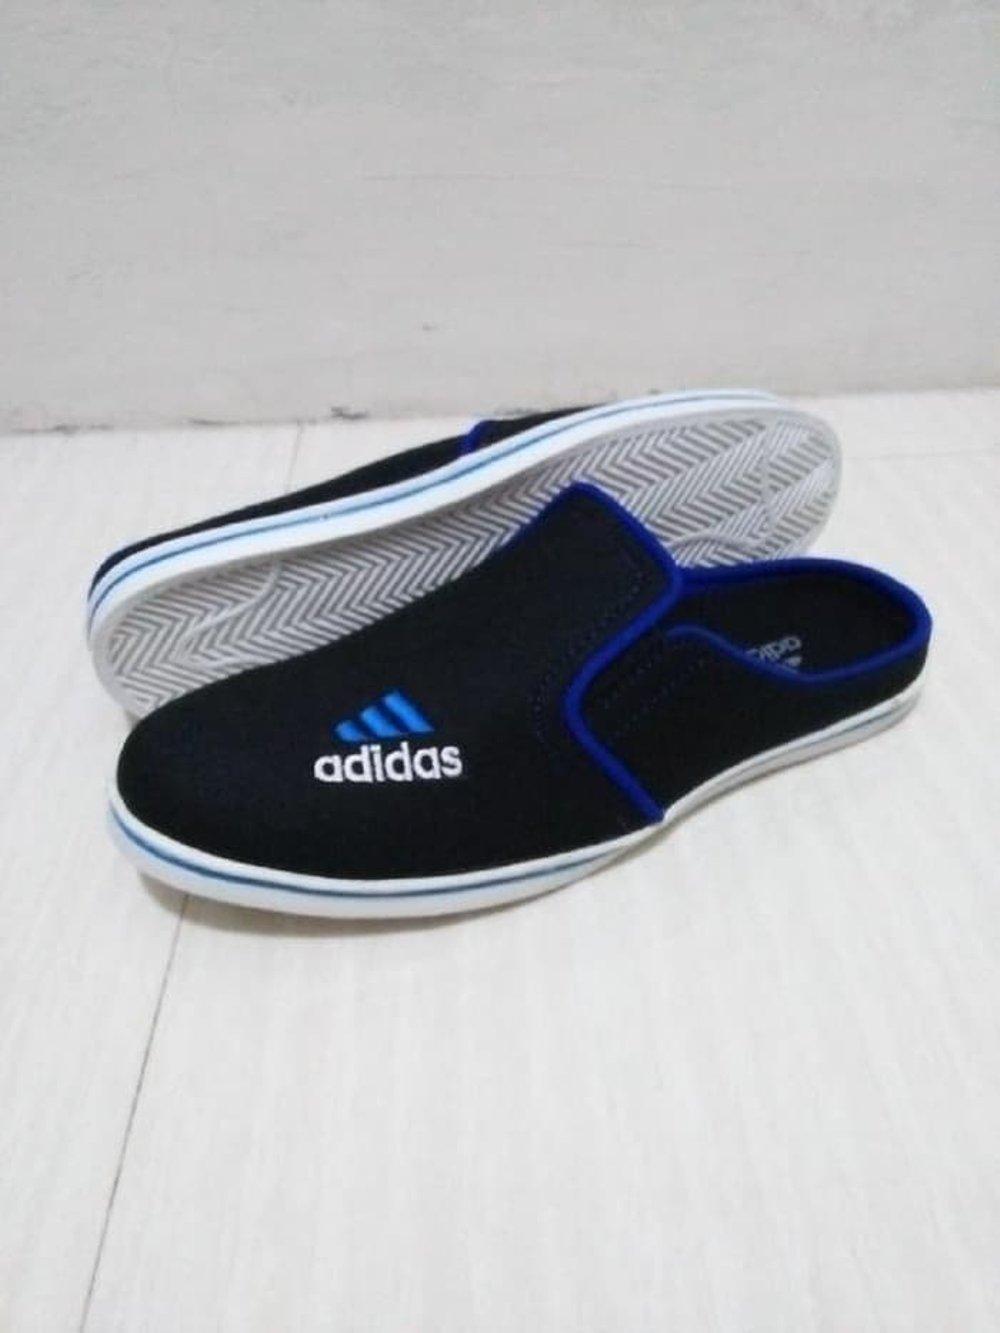 Sandal Slop Adidas Hitam Sepatu Slop Pria Santai Kerja Sekolah di lapak Risky jersy 99 rohmat_sahid